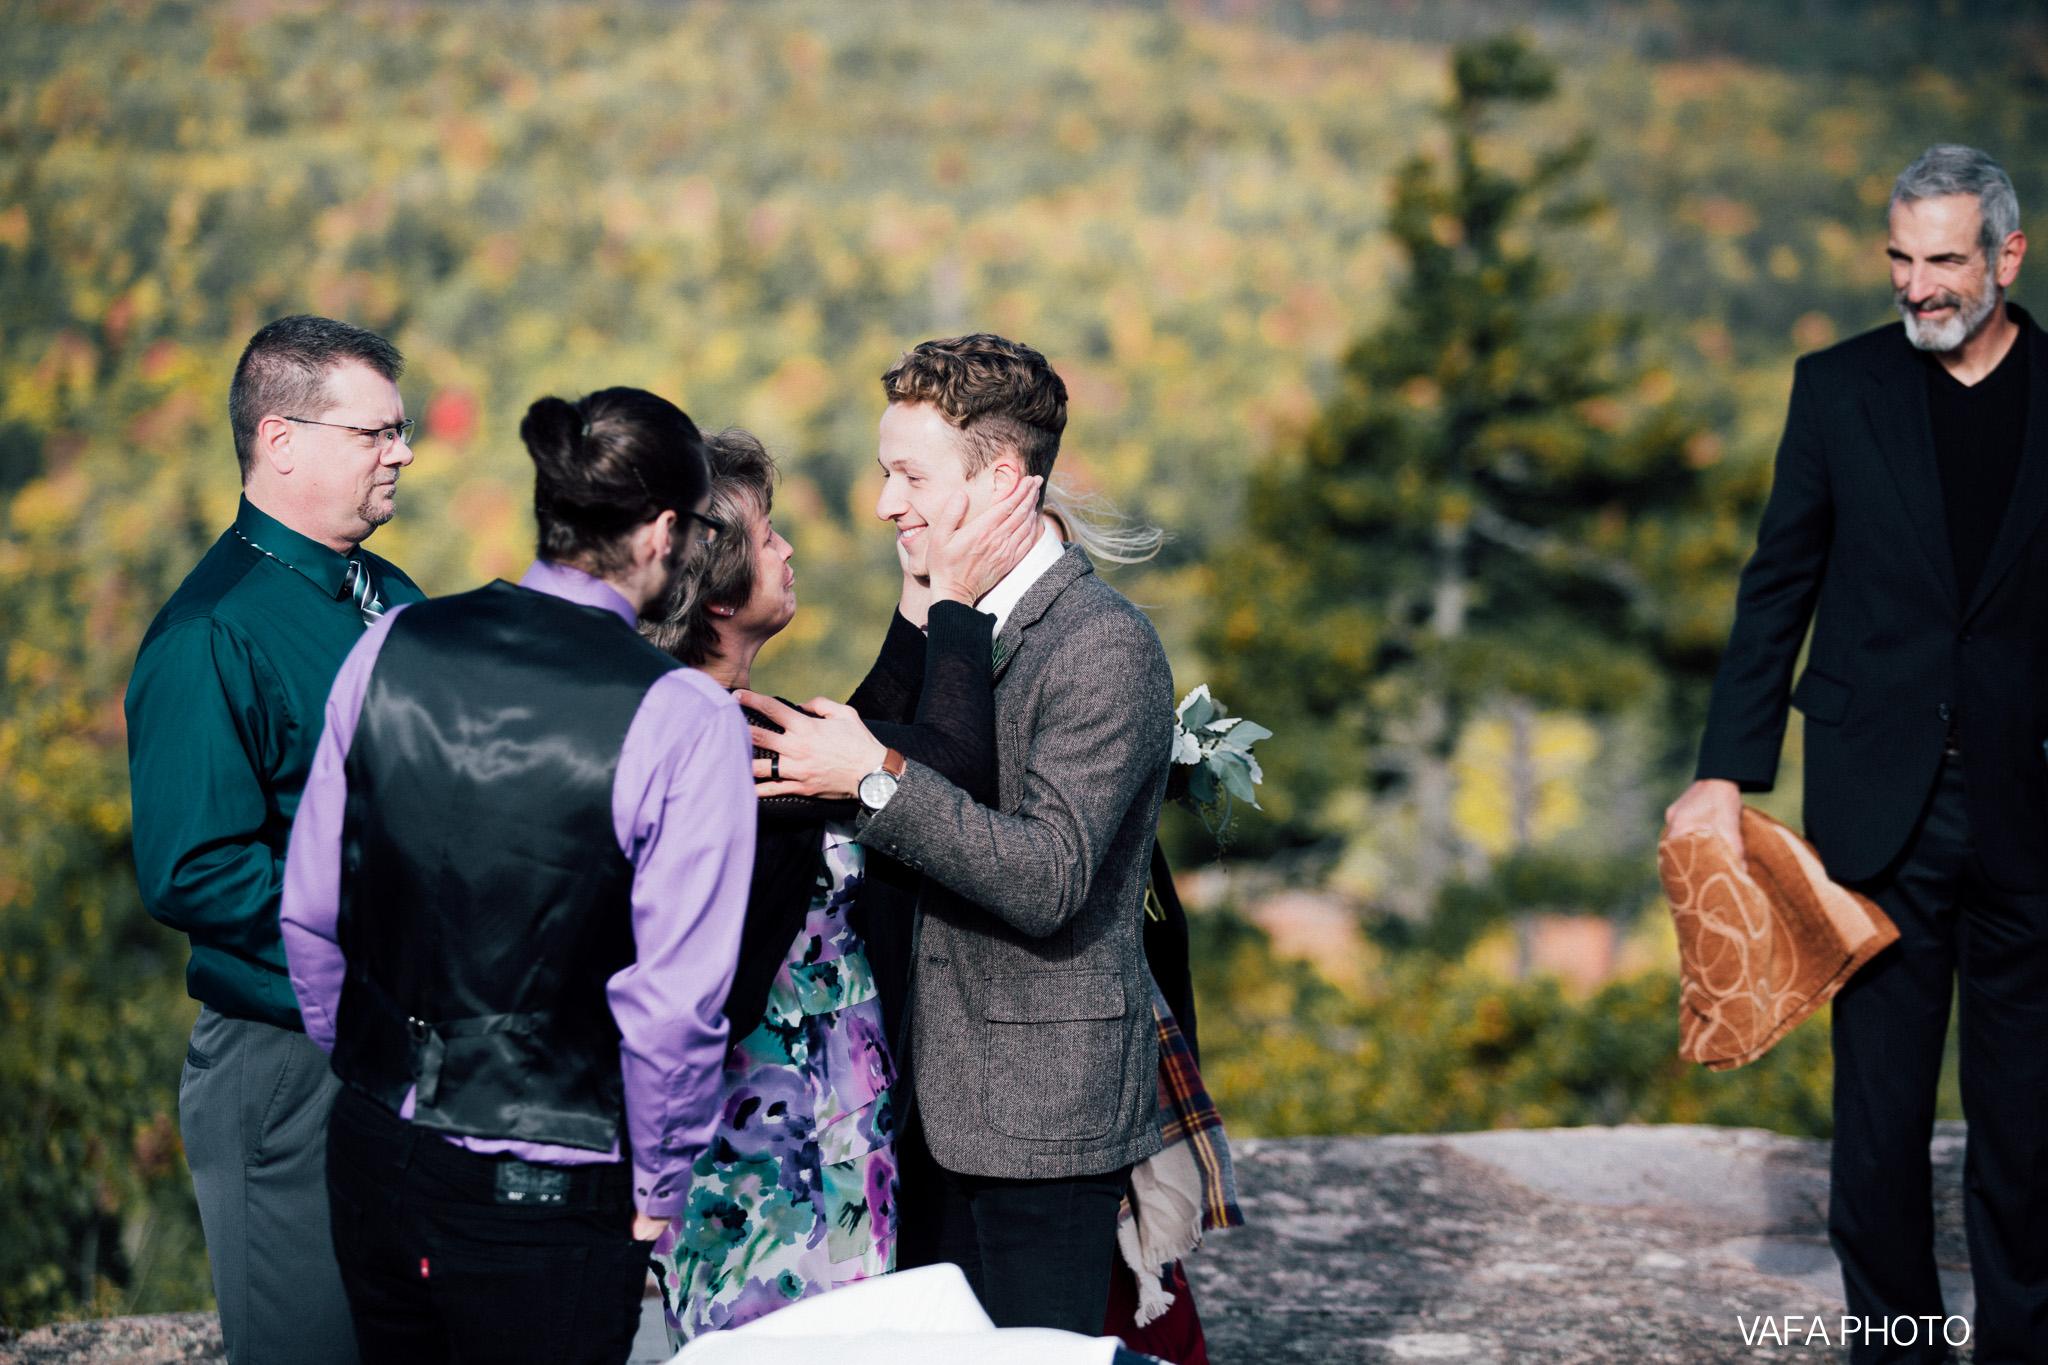 Hogback-Mountain-Wedding-Chelsea-Josh-Vafa-Photo-270.jpg